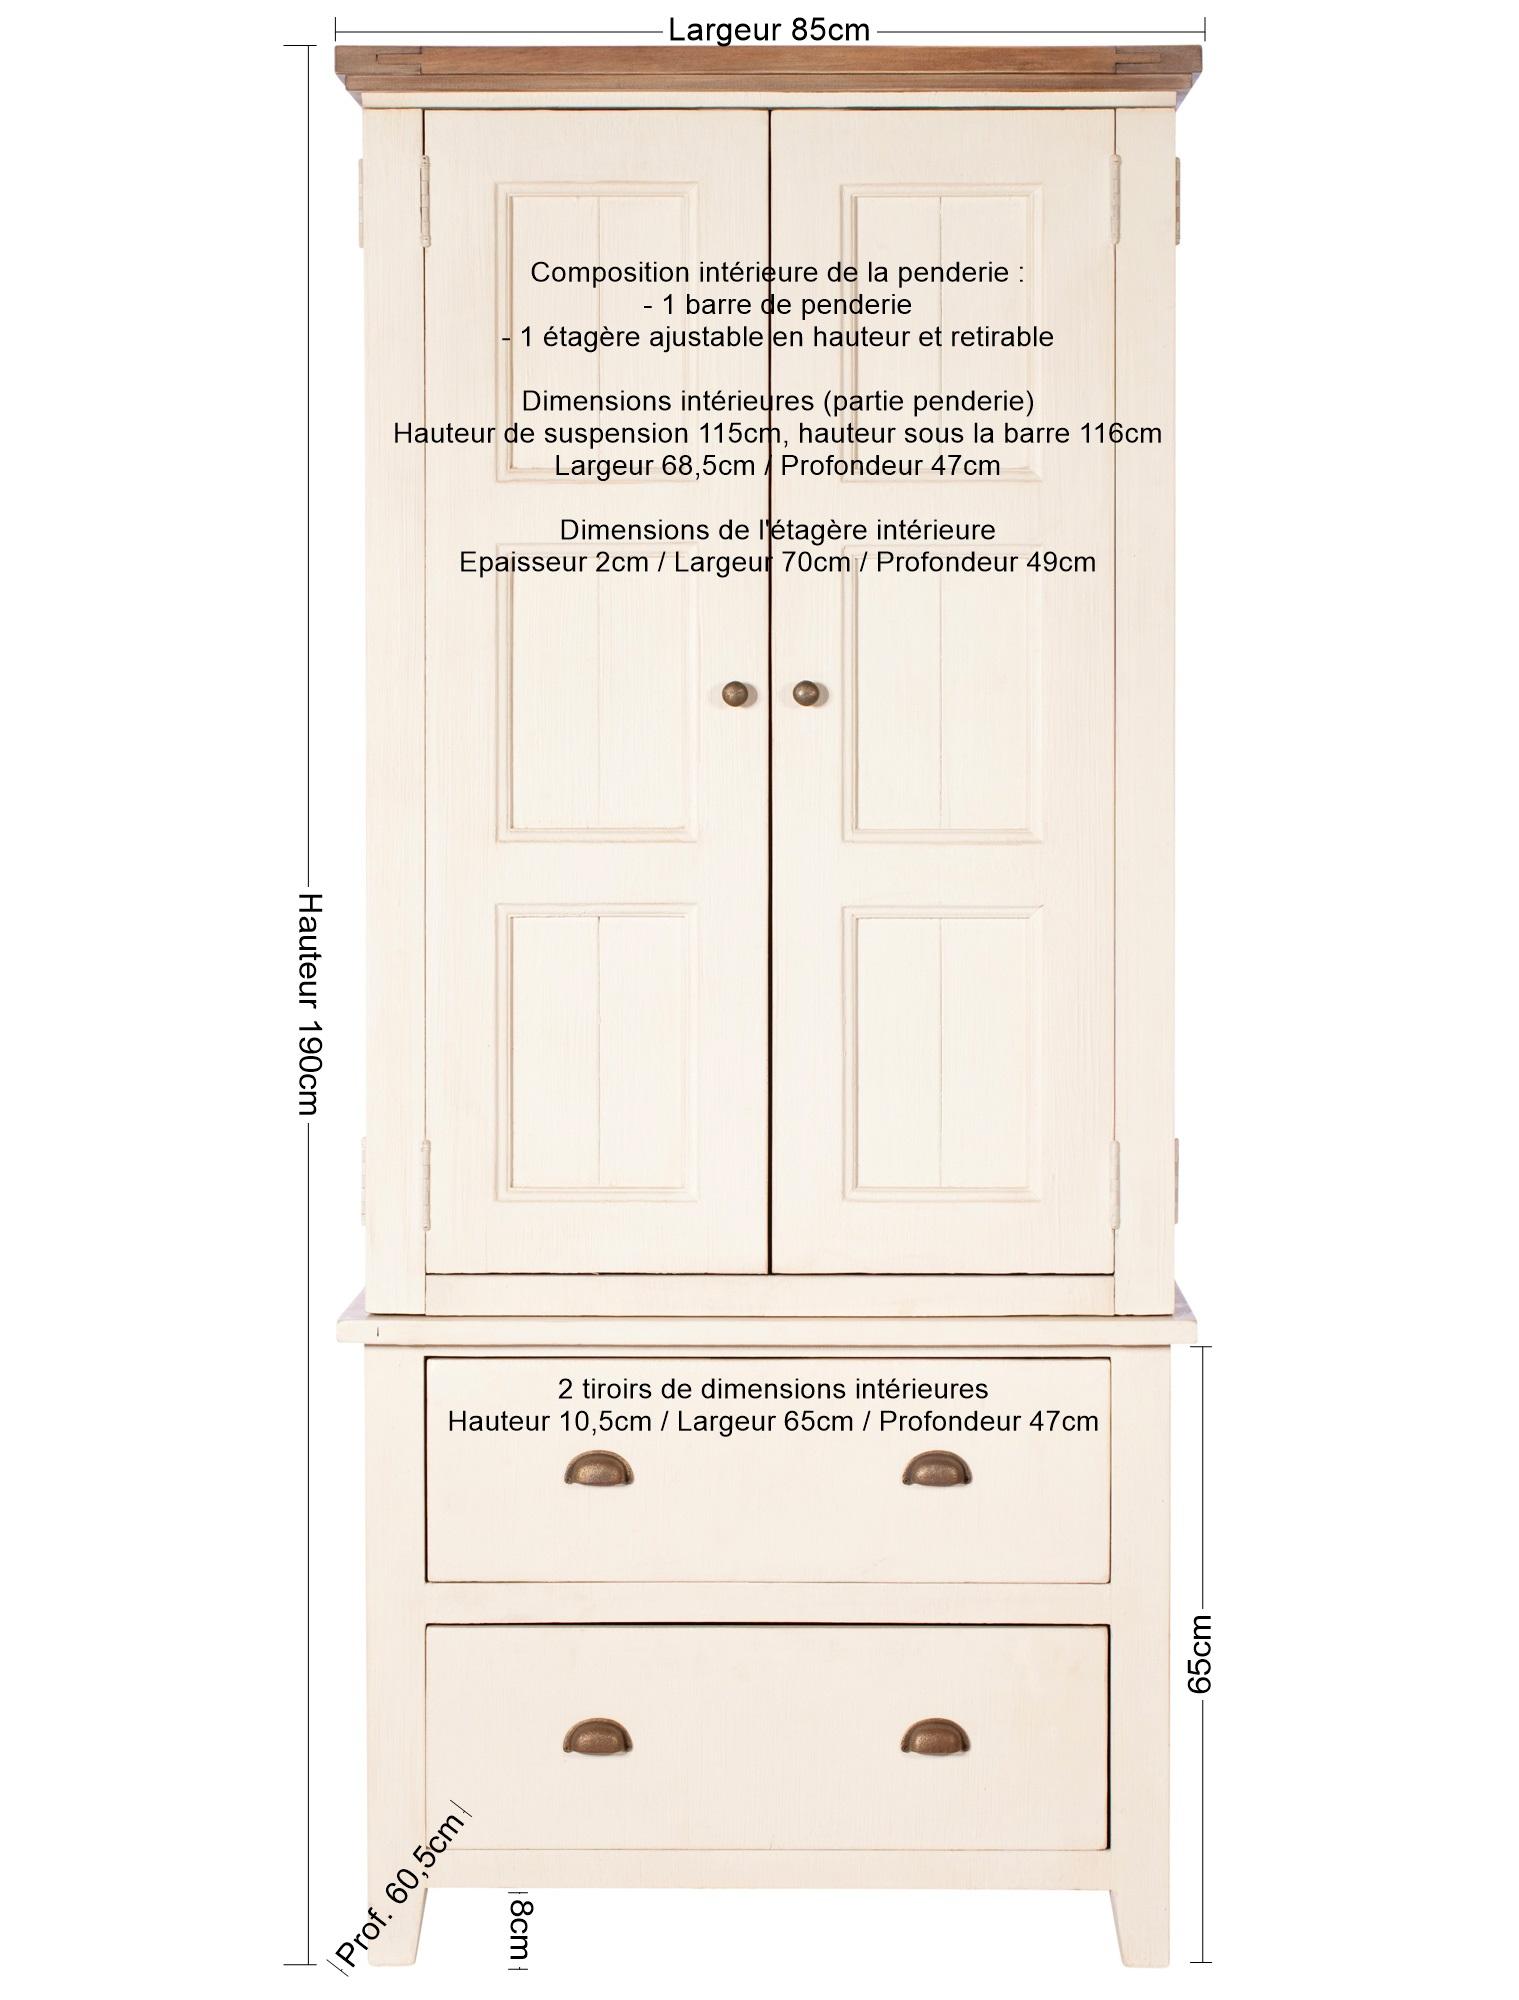 armoire penderie blanche bois recycle 85 cm bristol